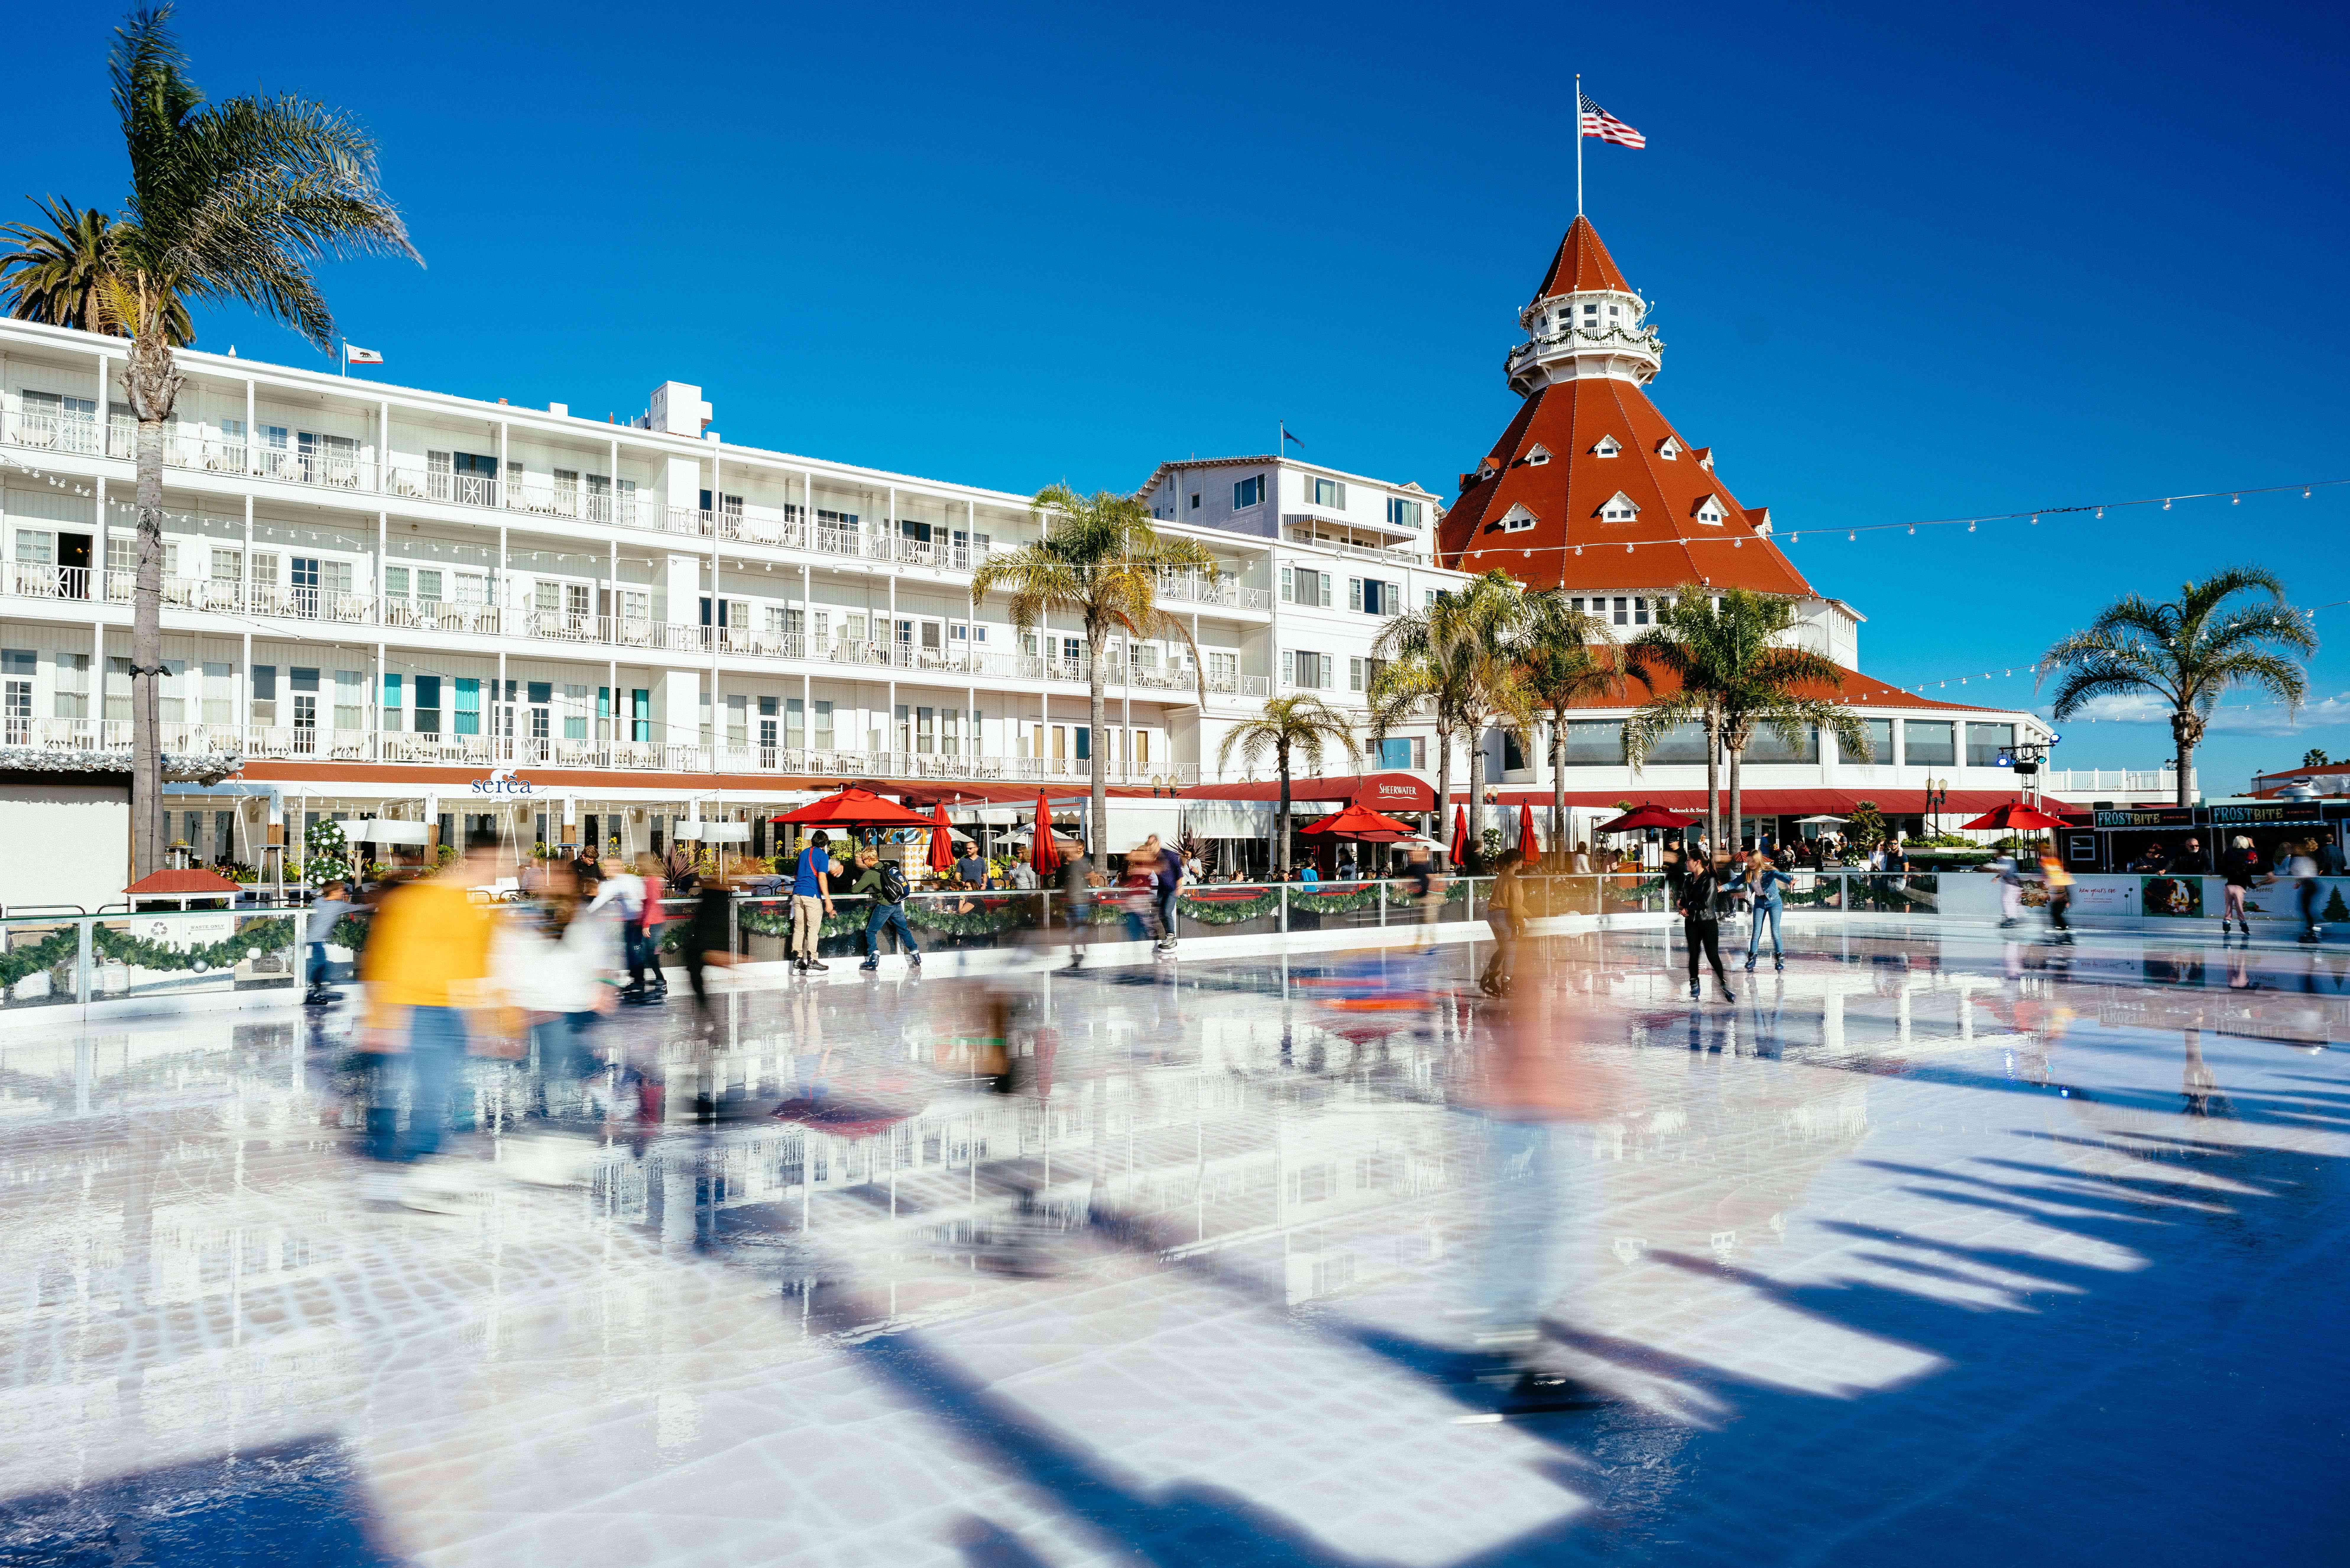 Main pavillion of Coronado passing by the famous hotel